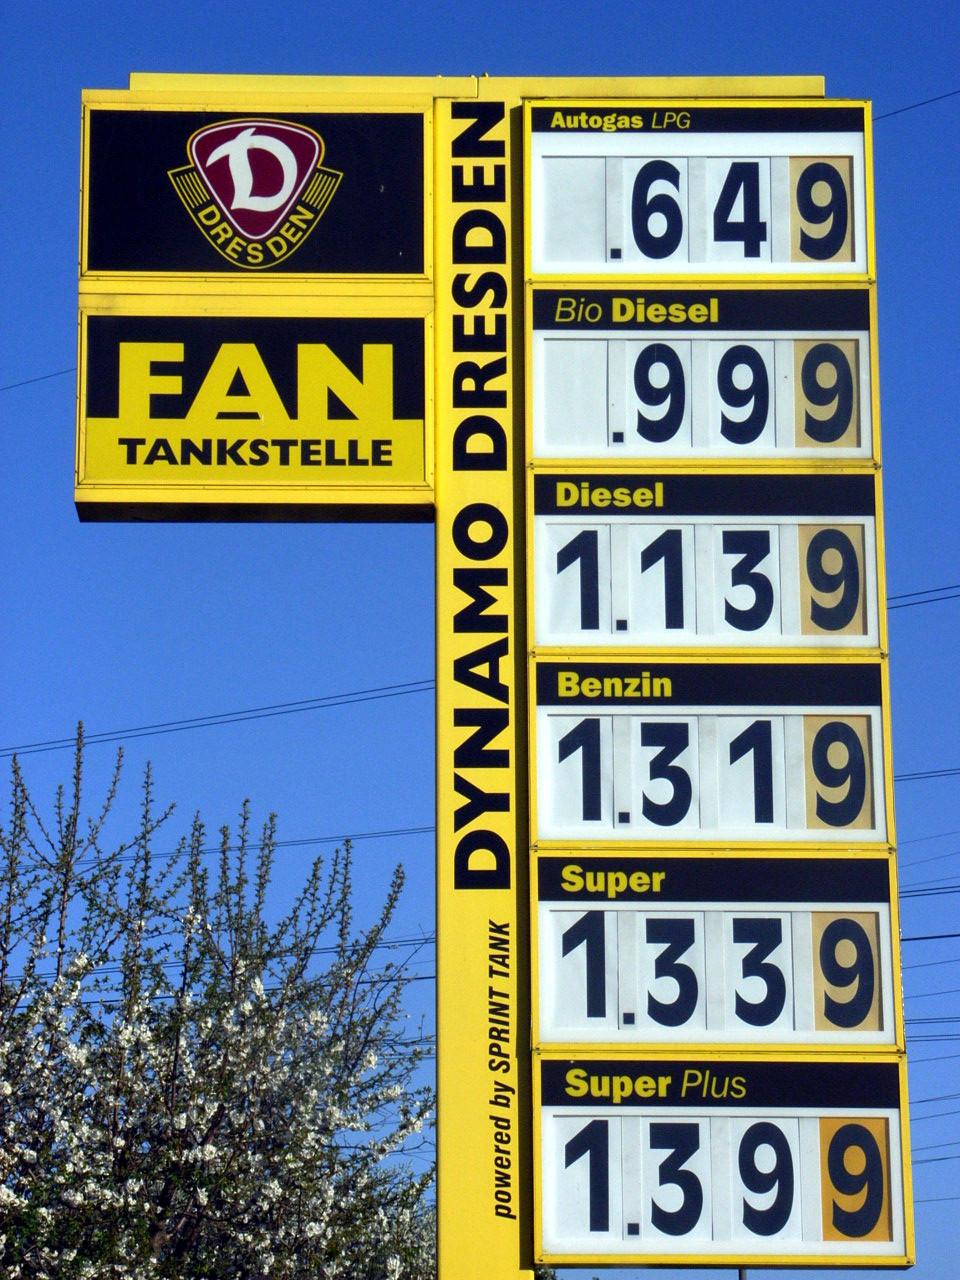 Car Fuel Price In Turkey